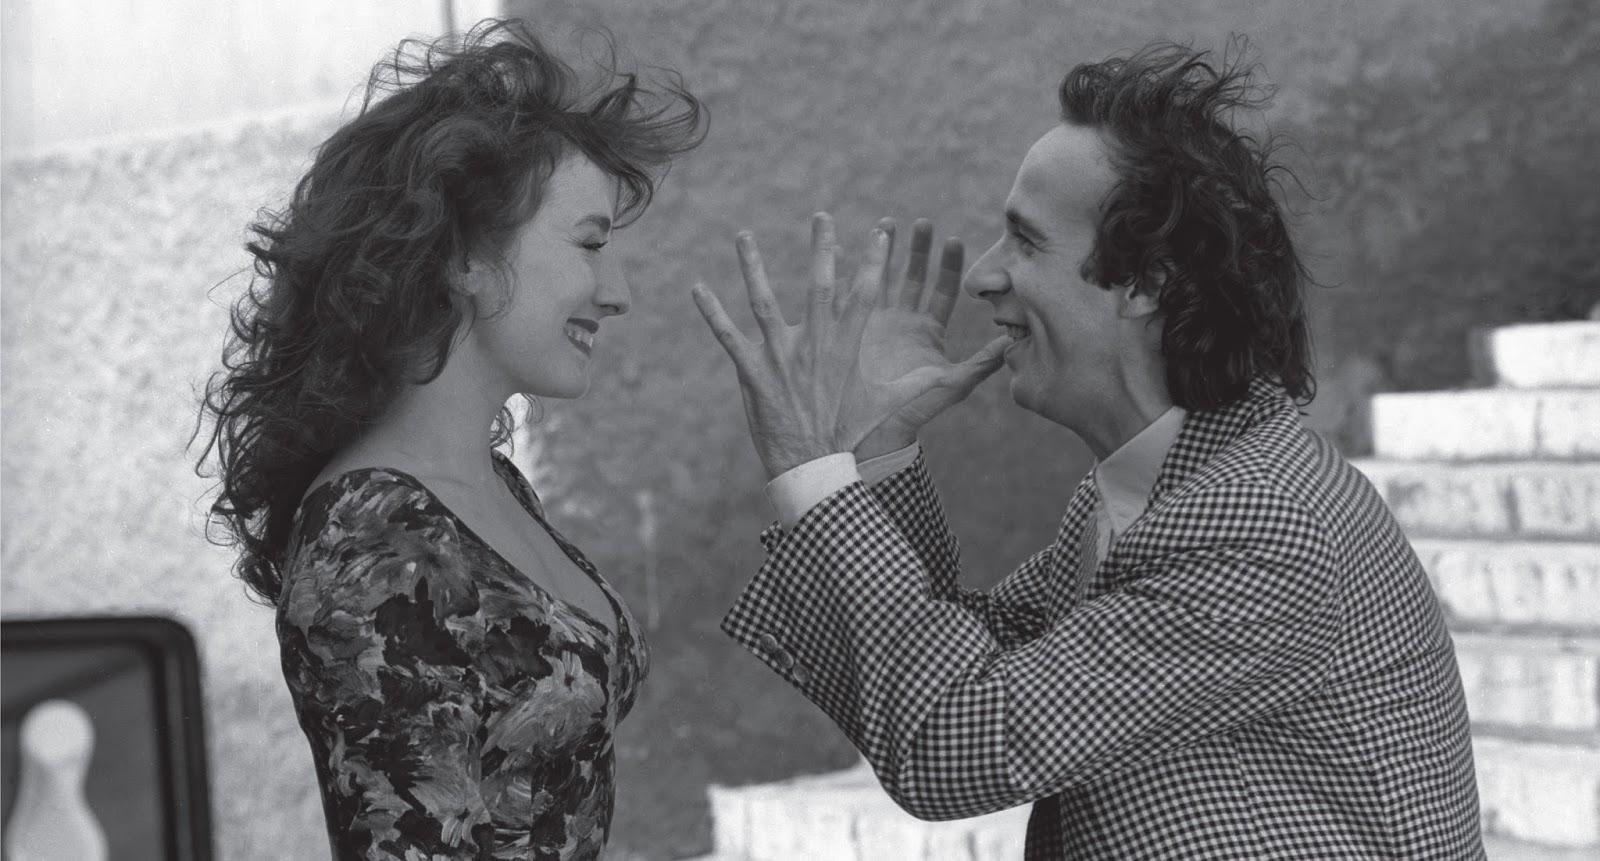 Nicoletta Braschi (born 1960)